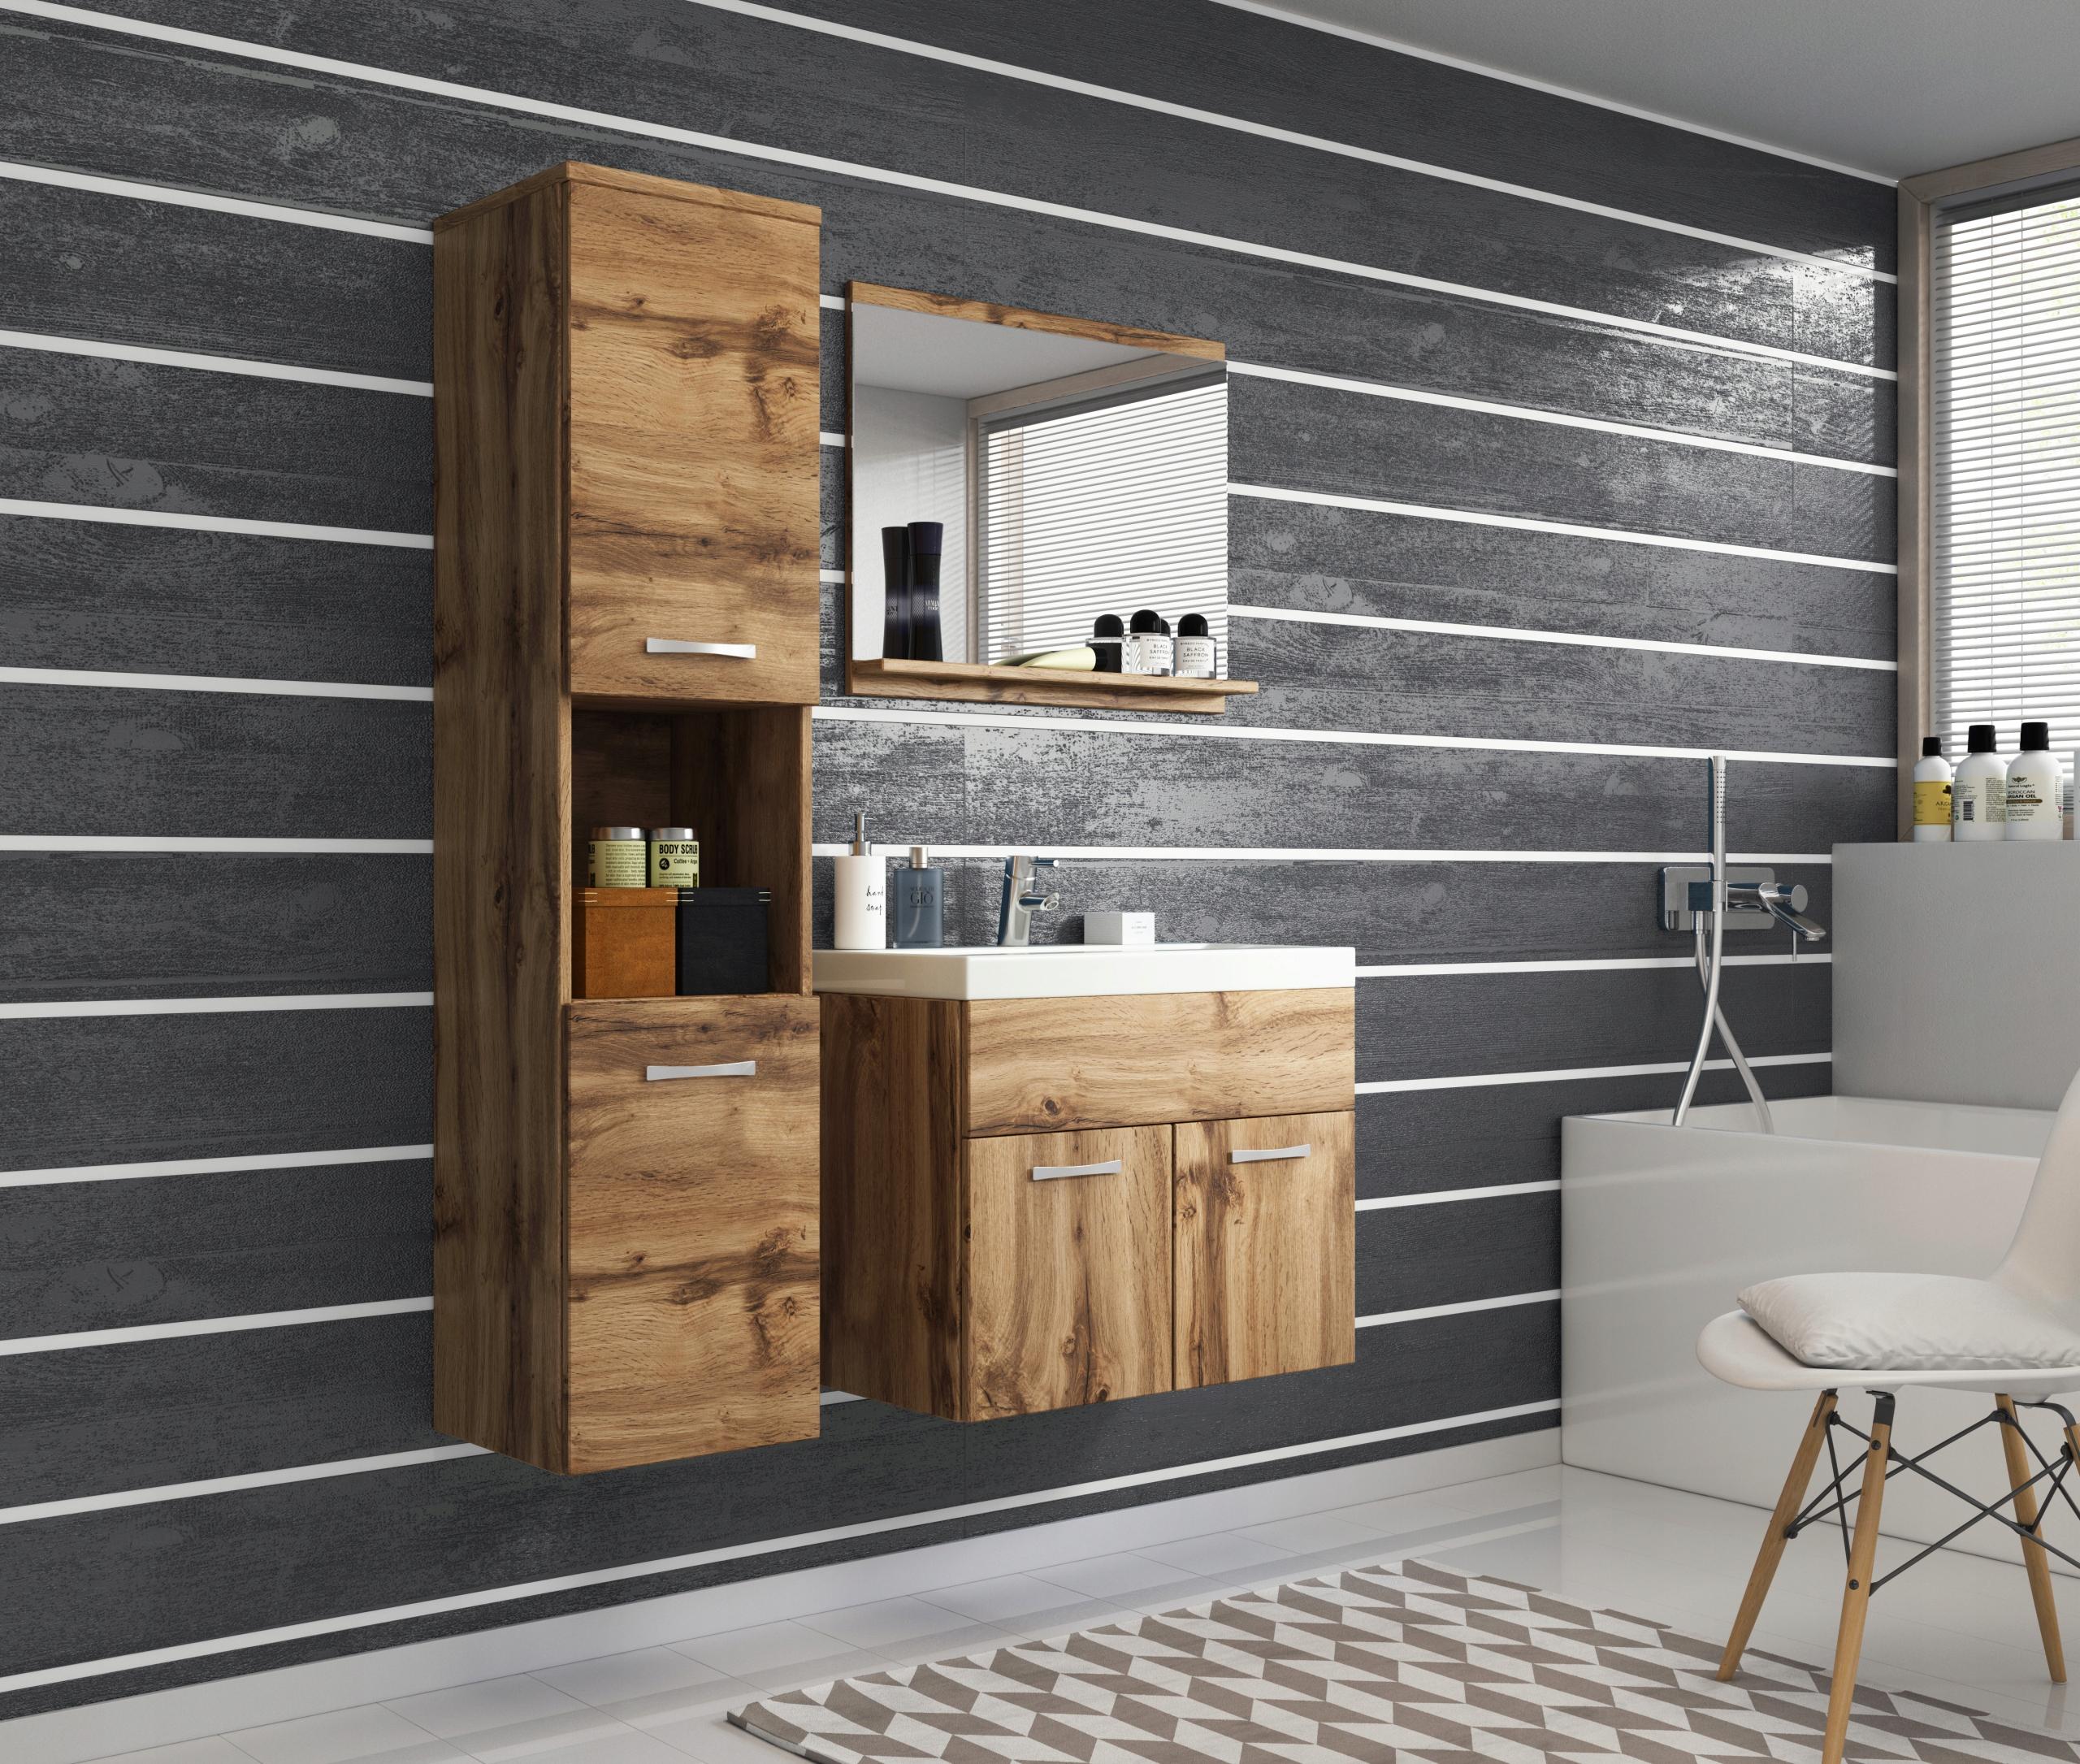 Meble łazienkowe MILANO, szafka, lustro, umywalka